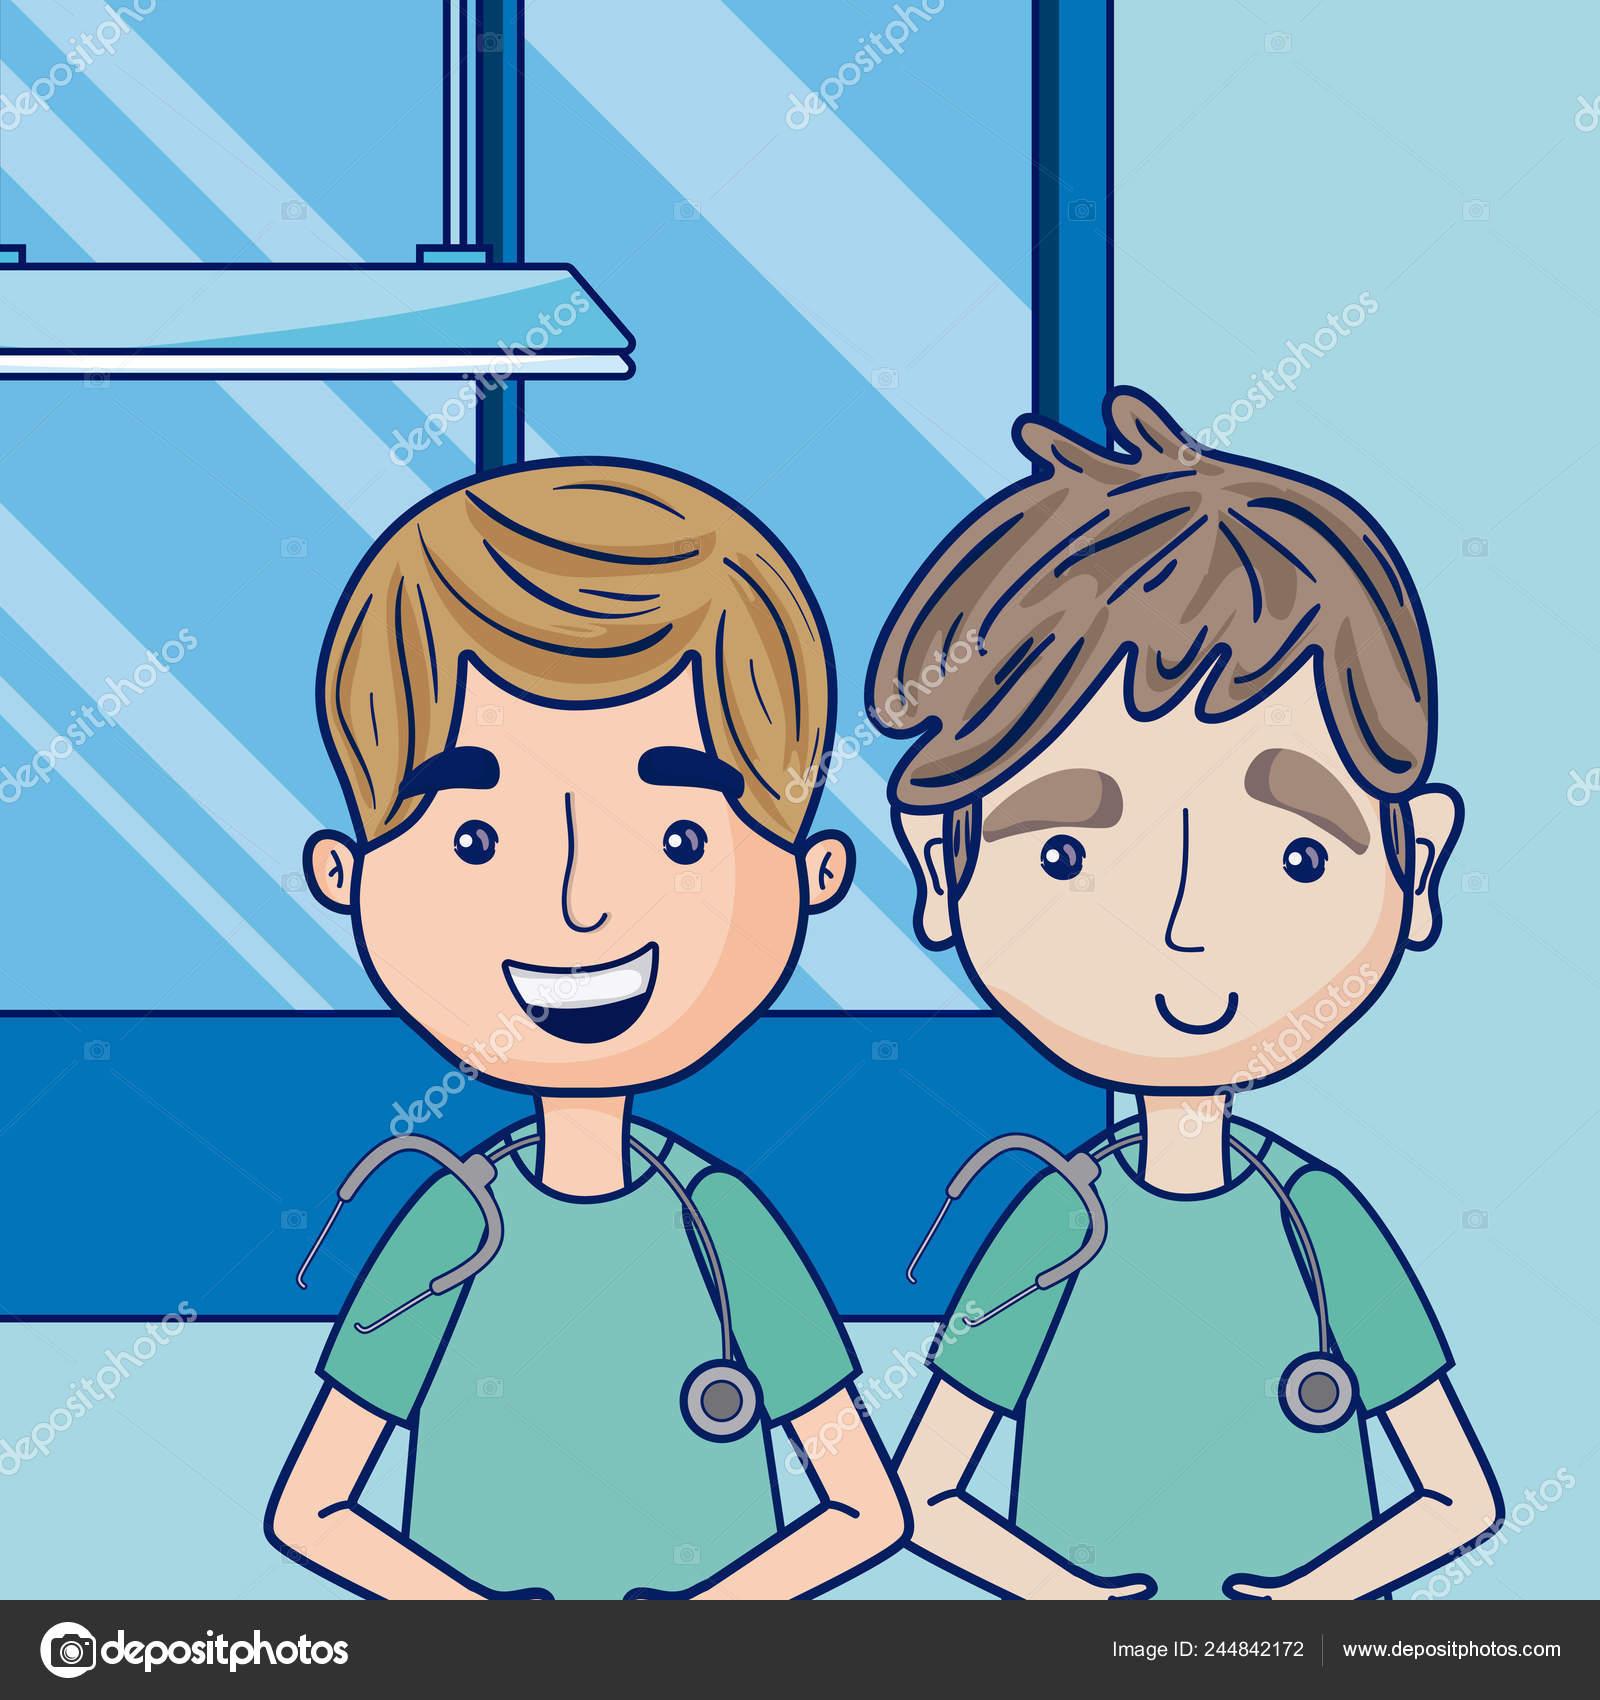 Funny Cartoon Hospital Pics funny doctors cartoons hospital vector illustration graphic